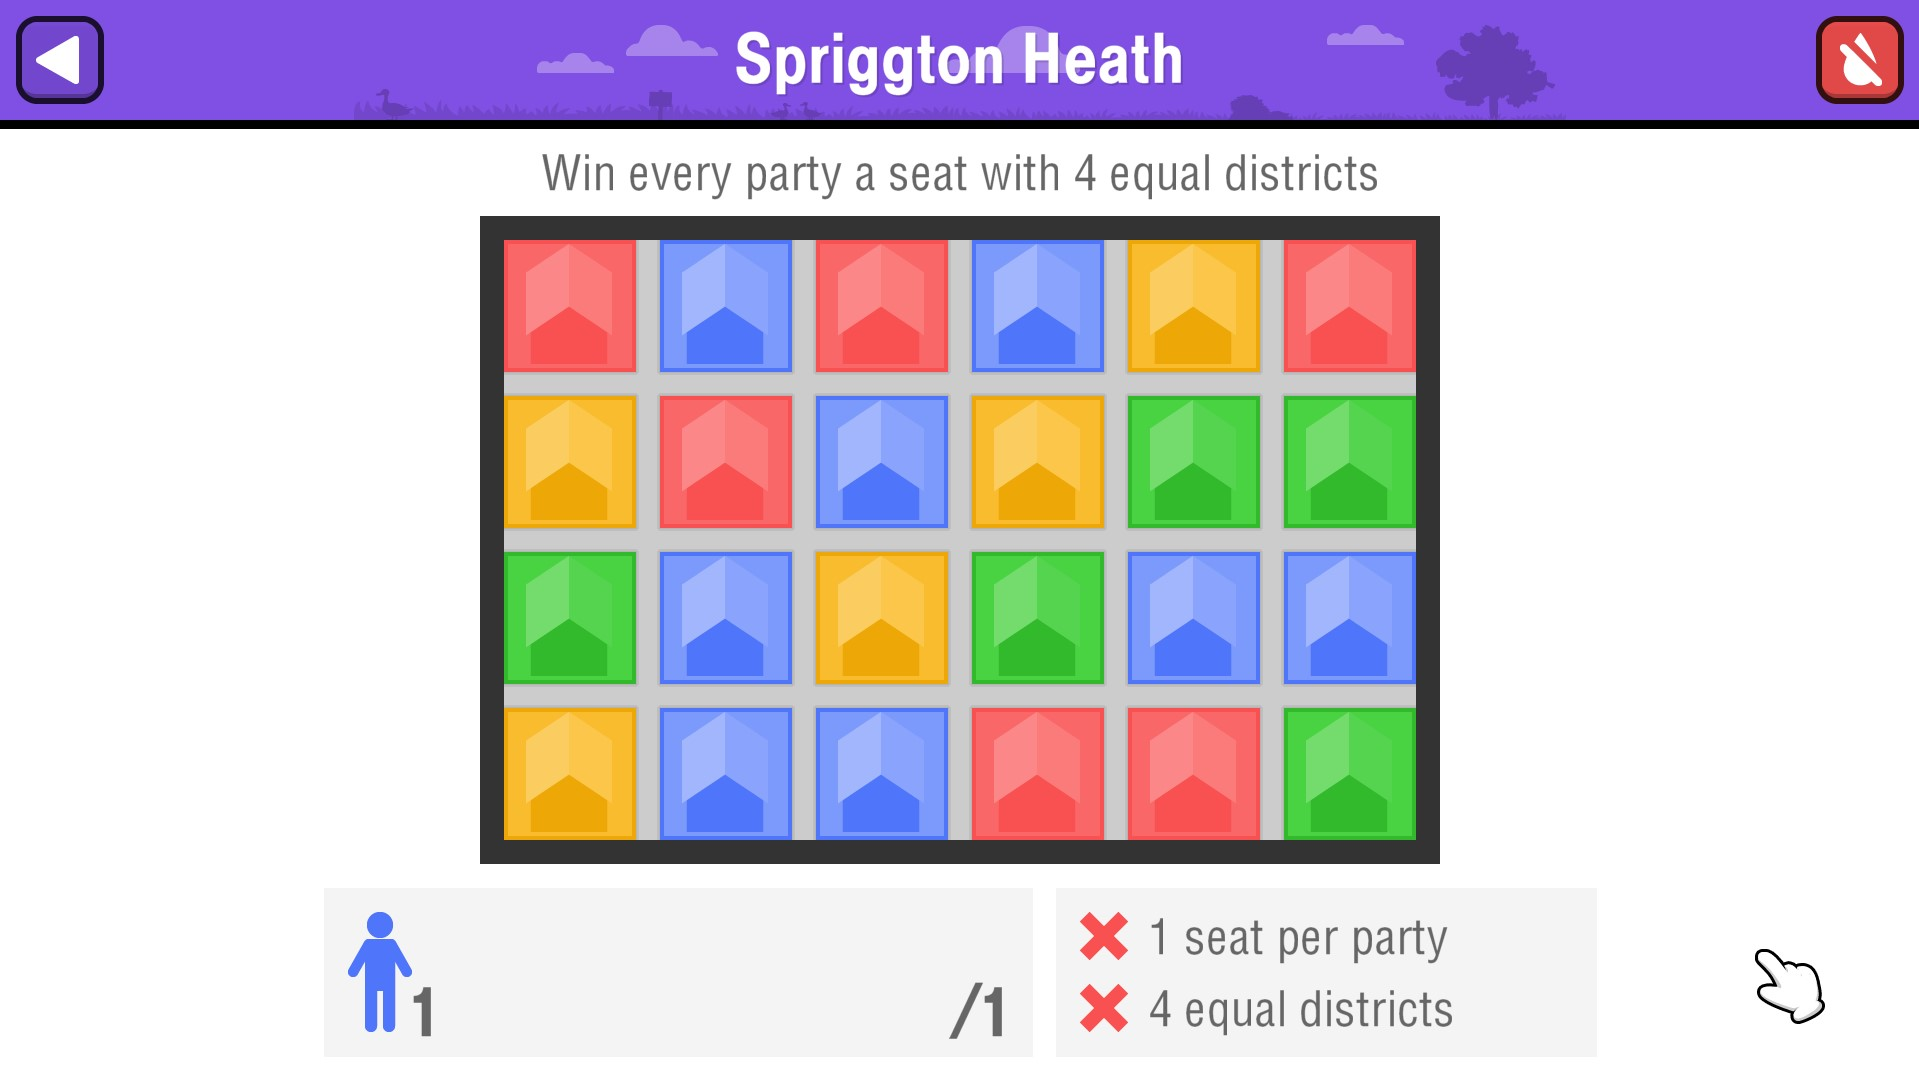 Spriggton Heath